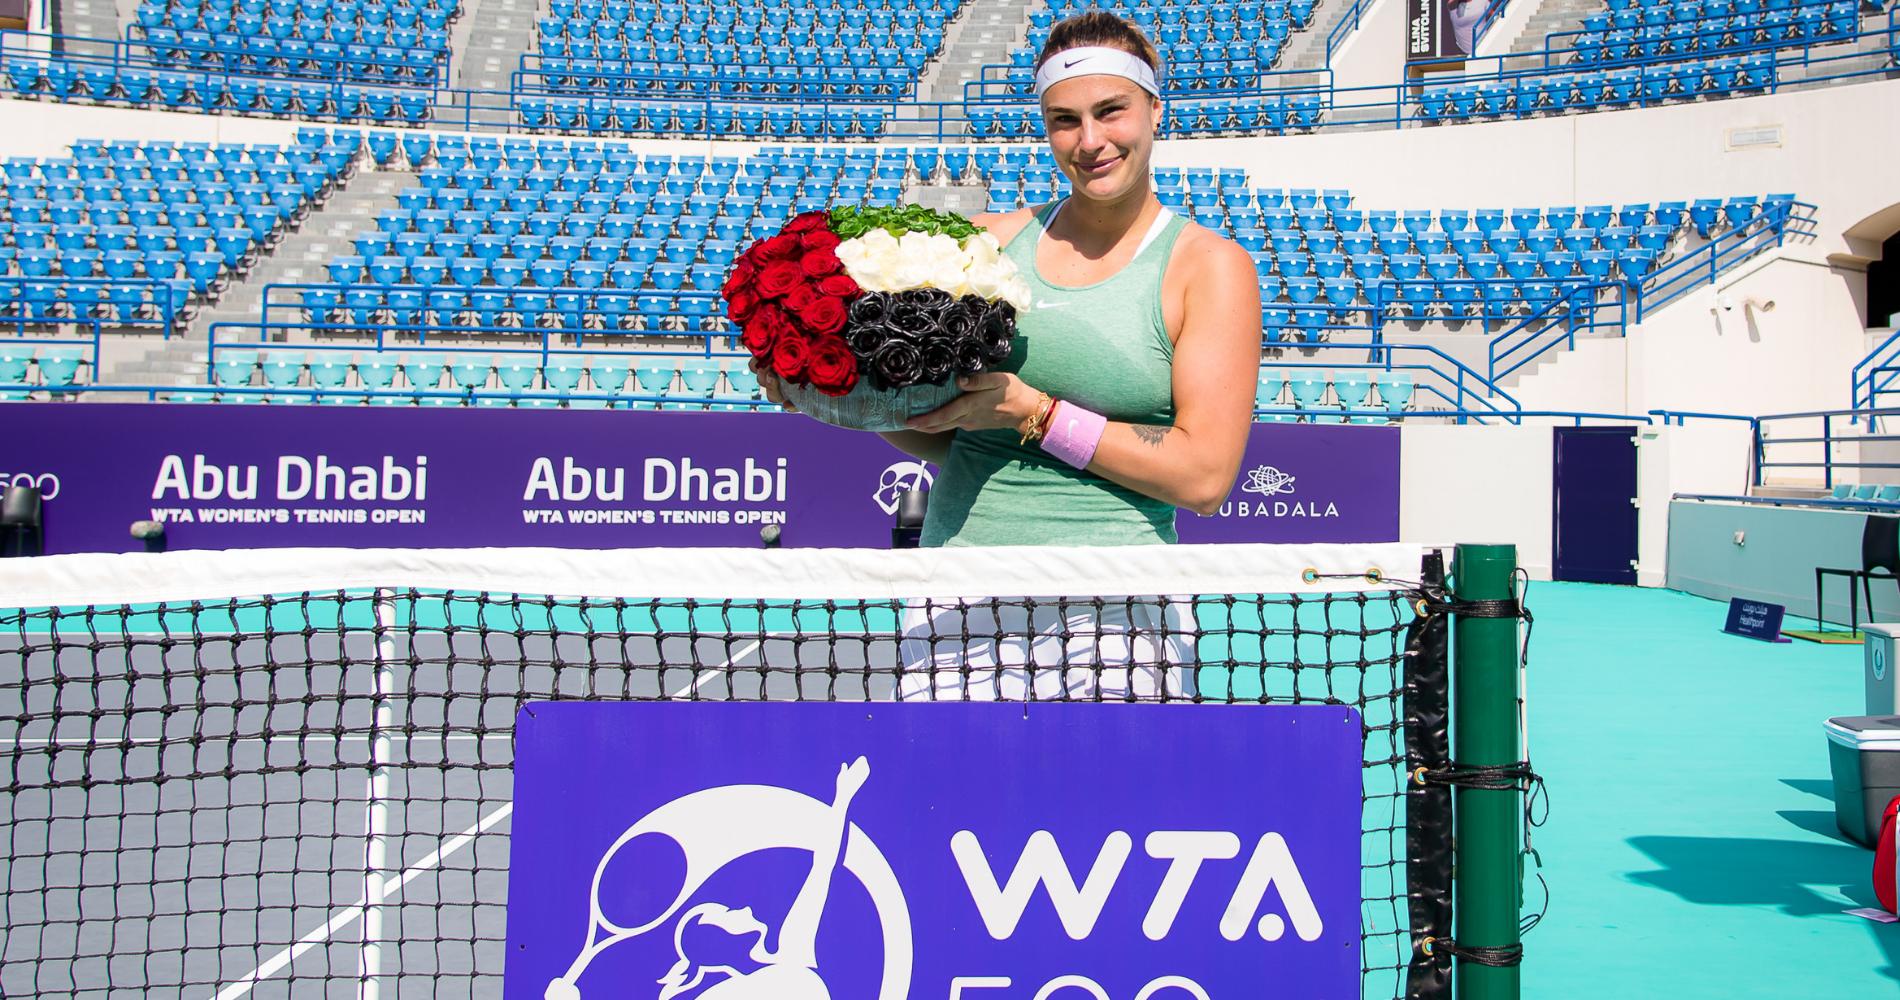 Aryna Sabalenka - Abu Dhabi 2021